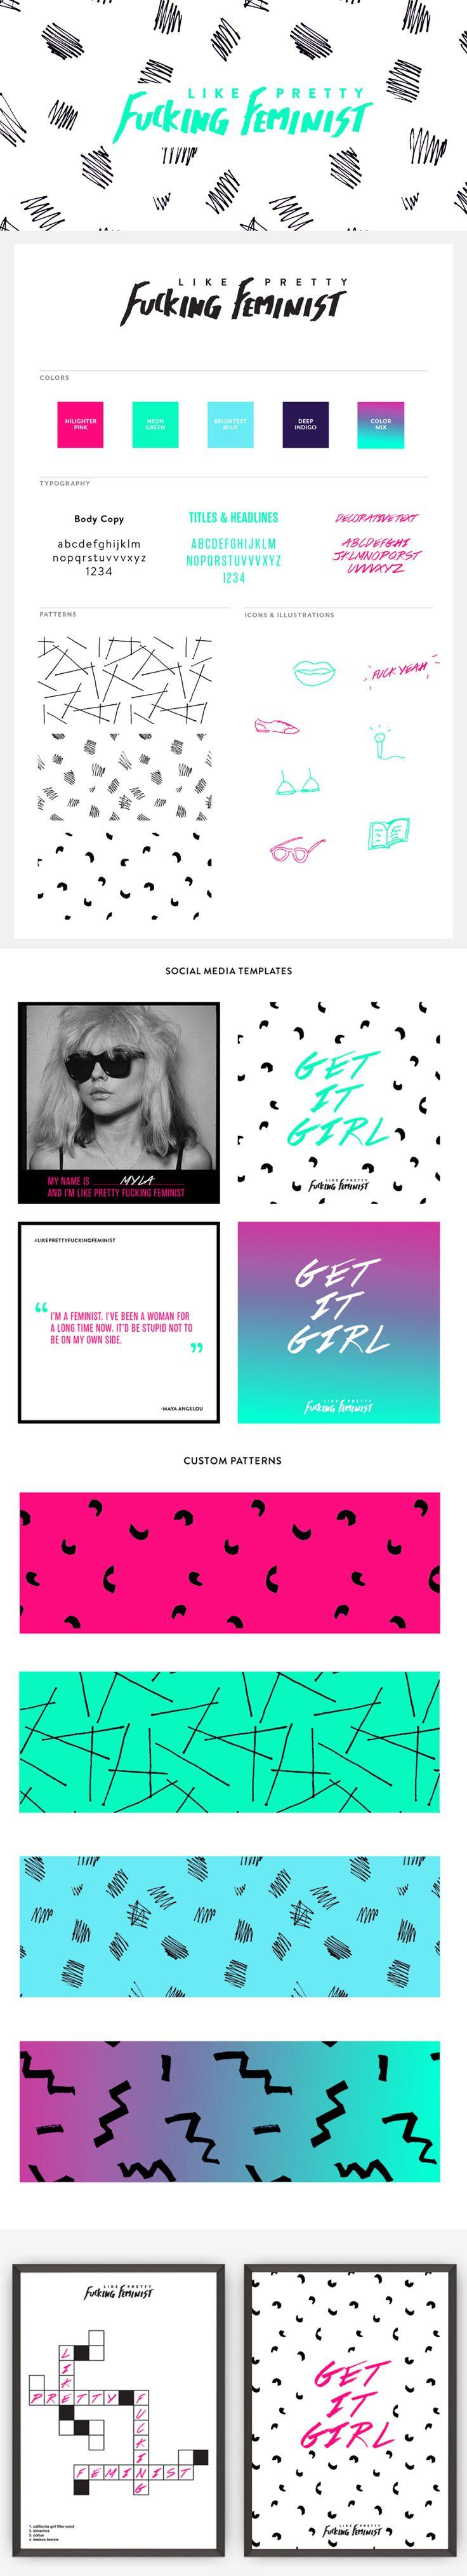 Like Pretty Fucking Feminist Brand Identity   Little Trailer Studio. Click through to view details.